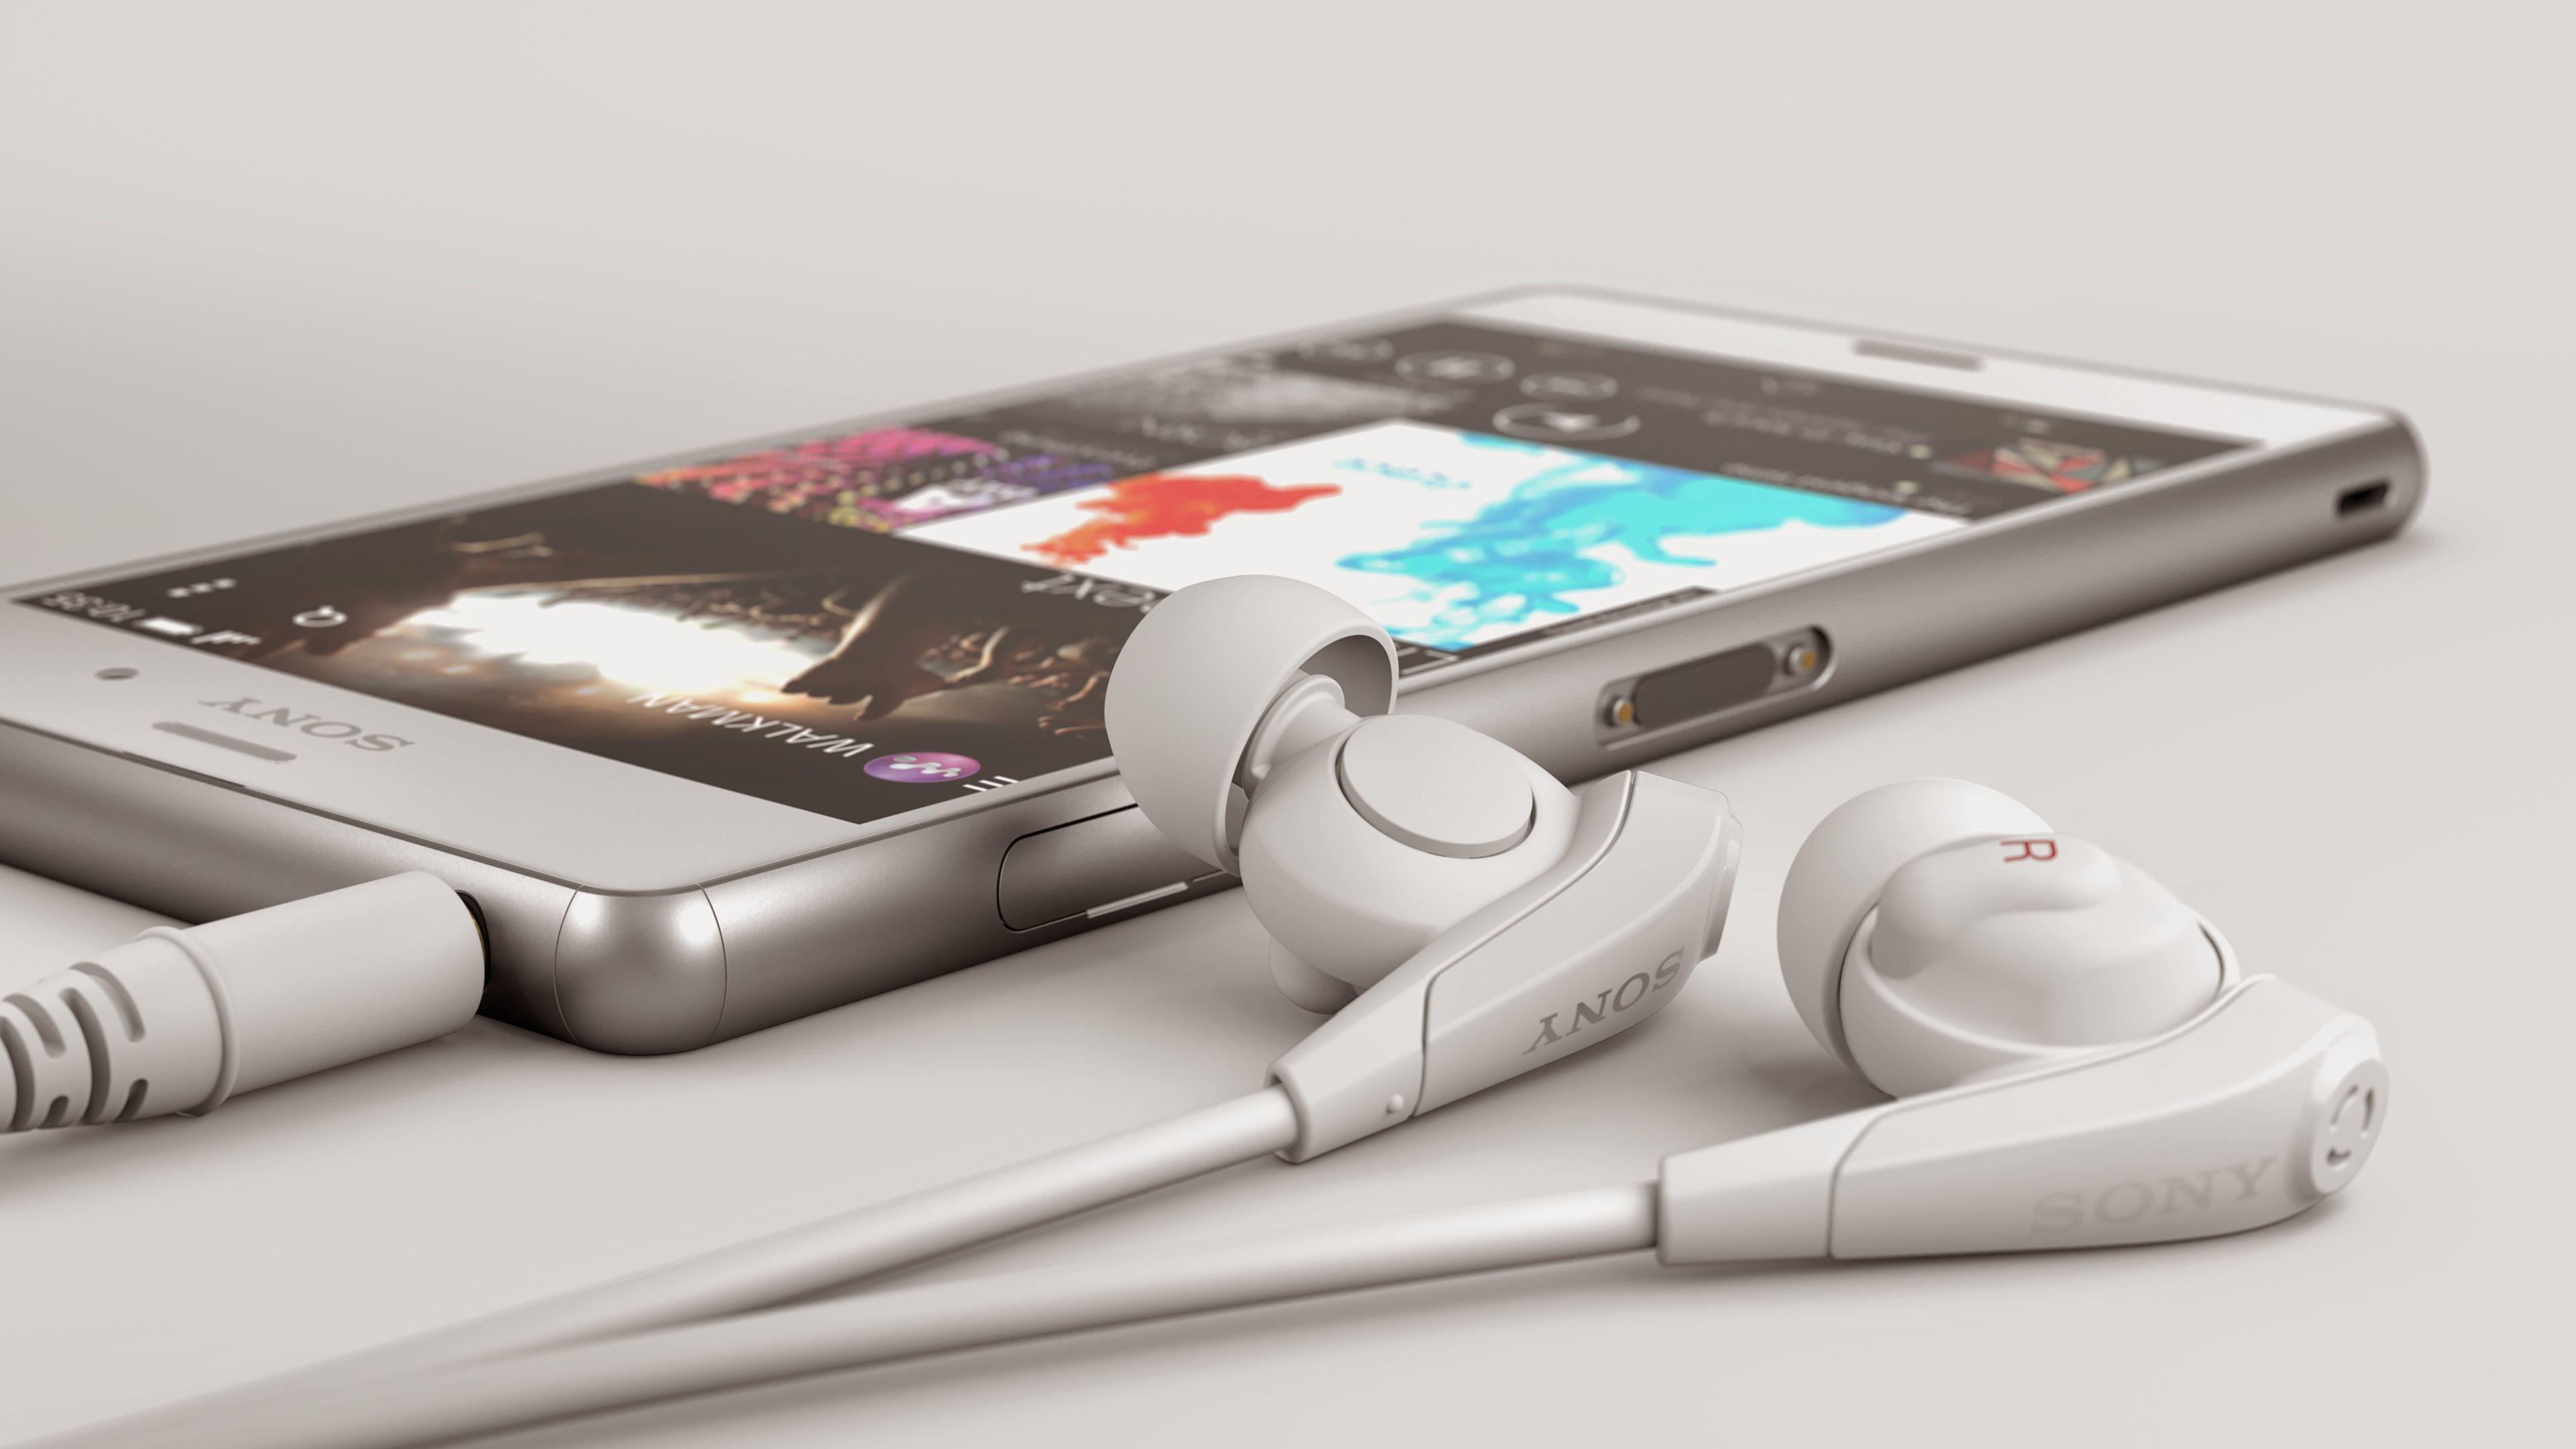 Hd wallpaper xperia z3 - Wallpaper 5 Sony Xperia Z3 Headphones Ultra Hd 4k 3840x2160